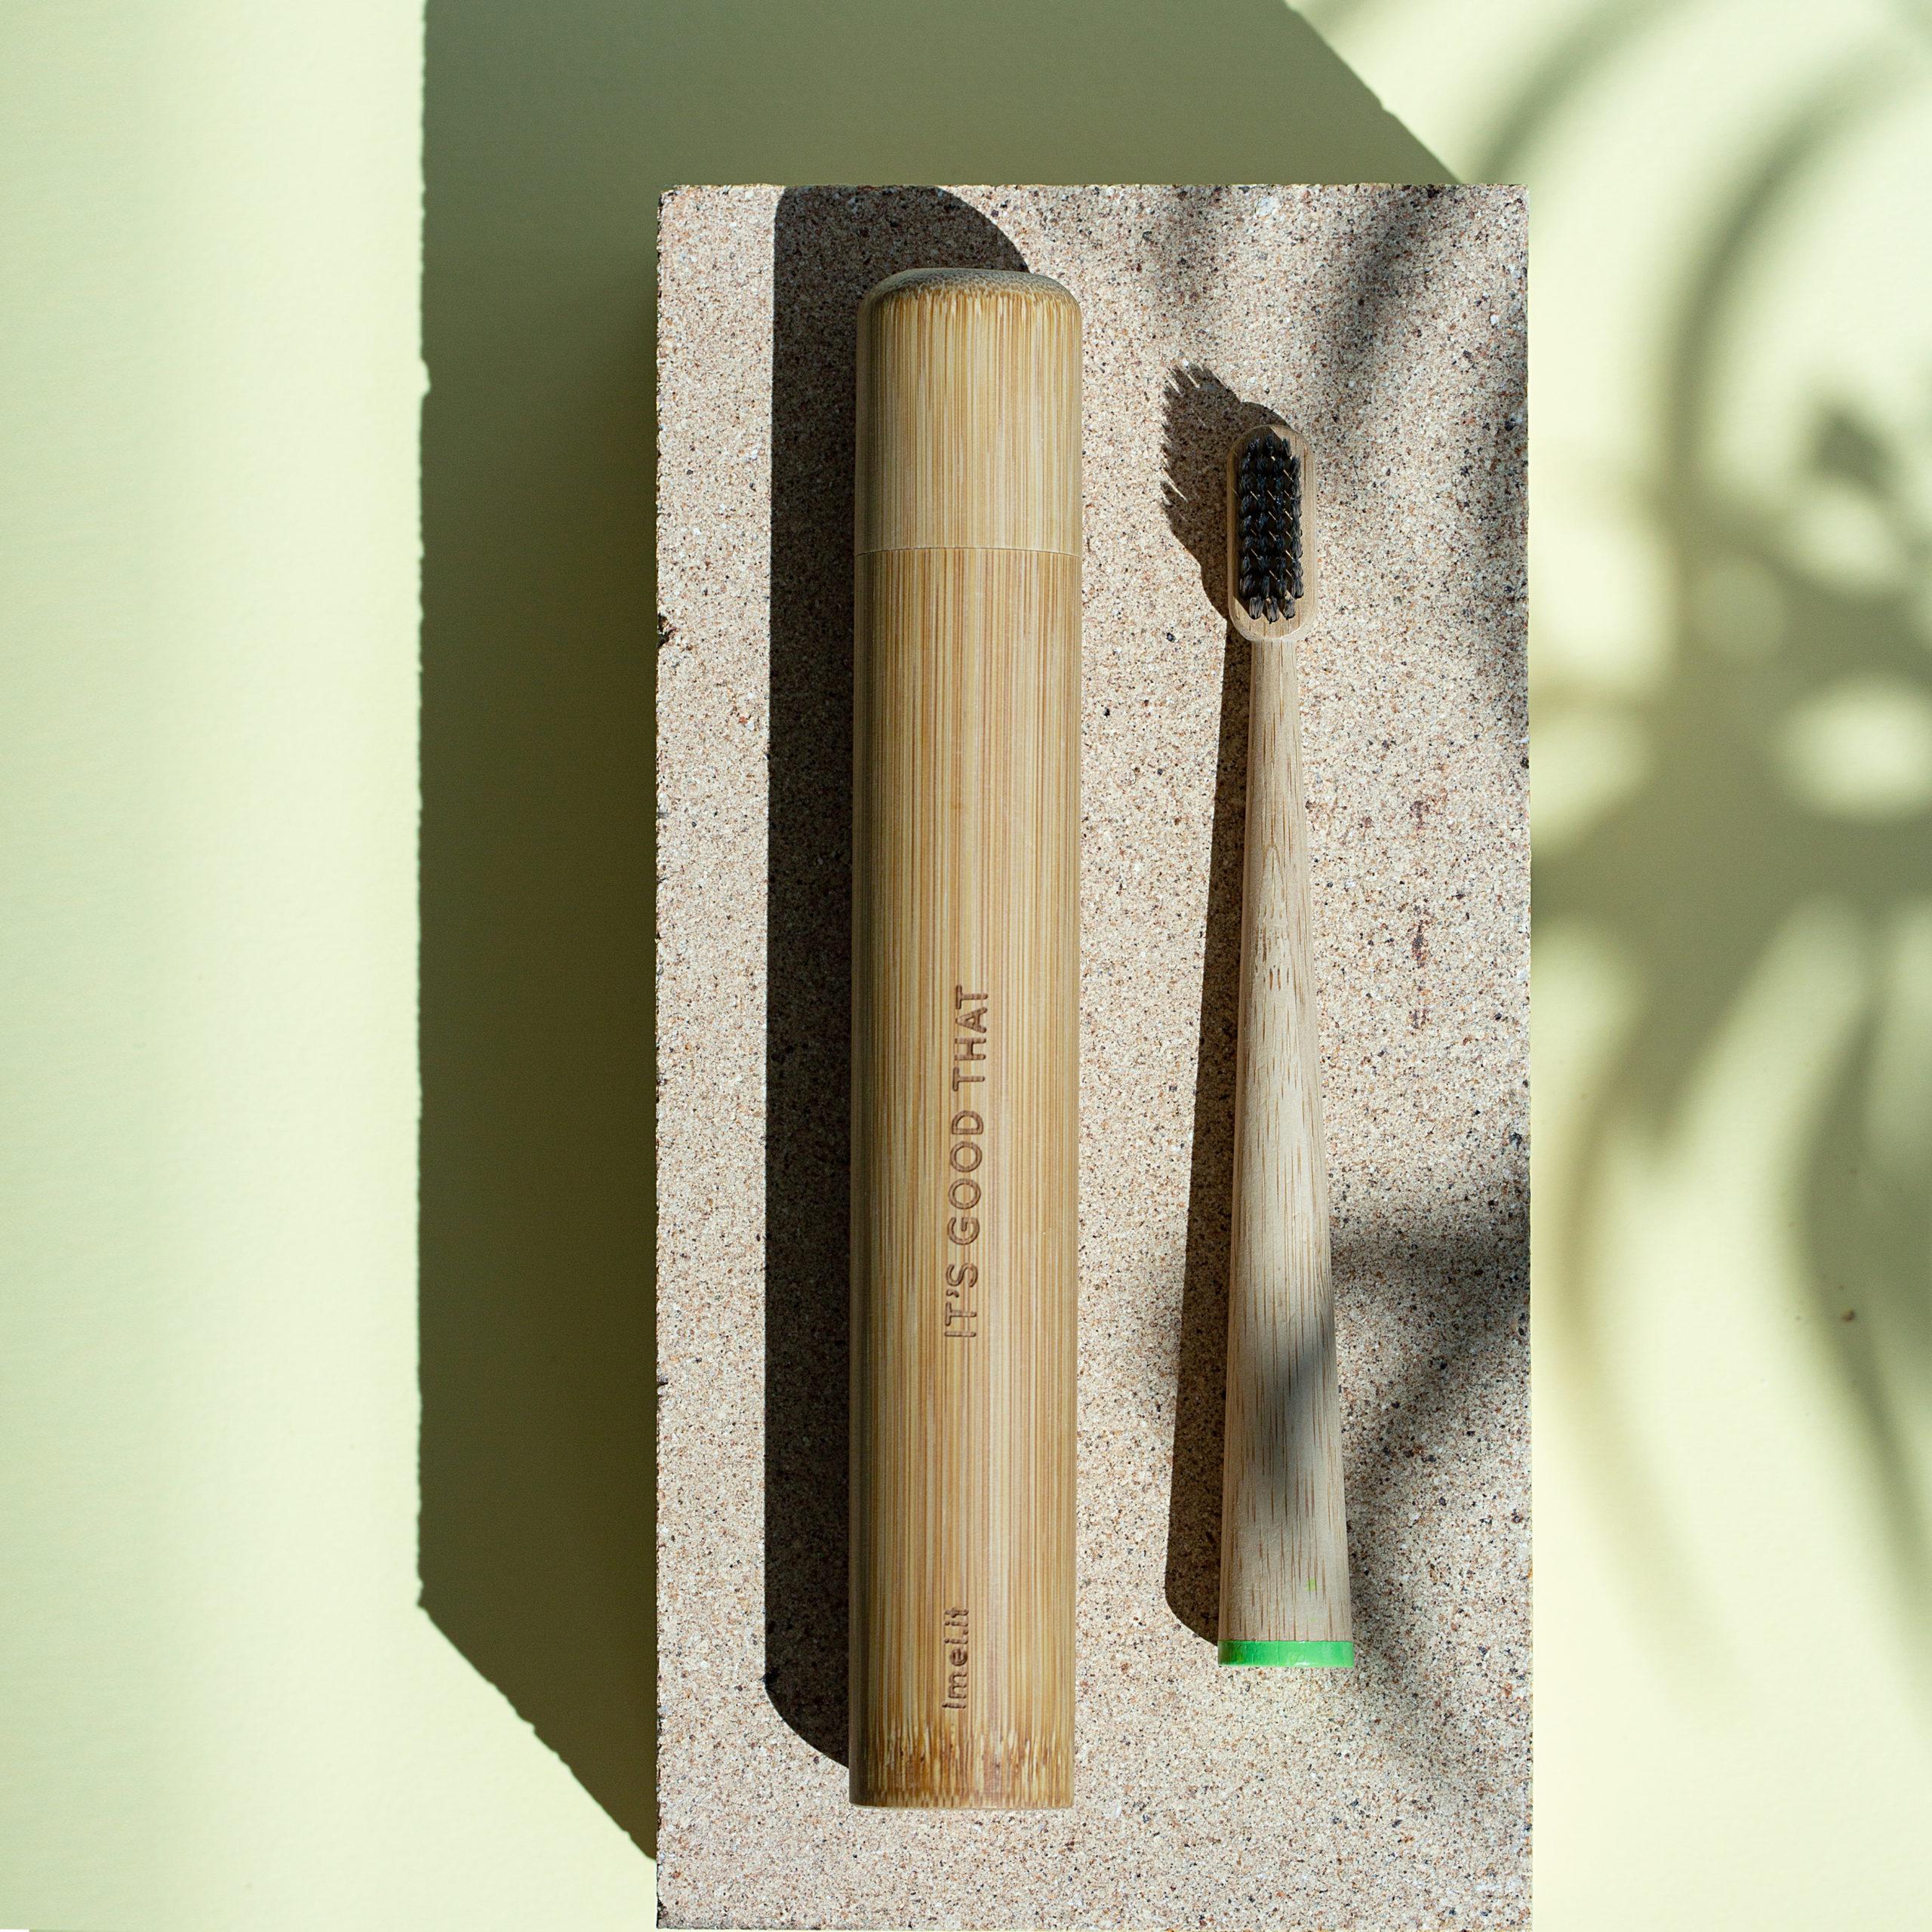 Set eco sostenibile spazzolino eco-friendly toothbrush